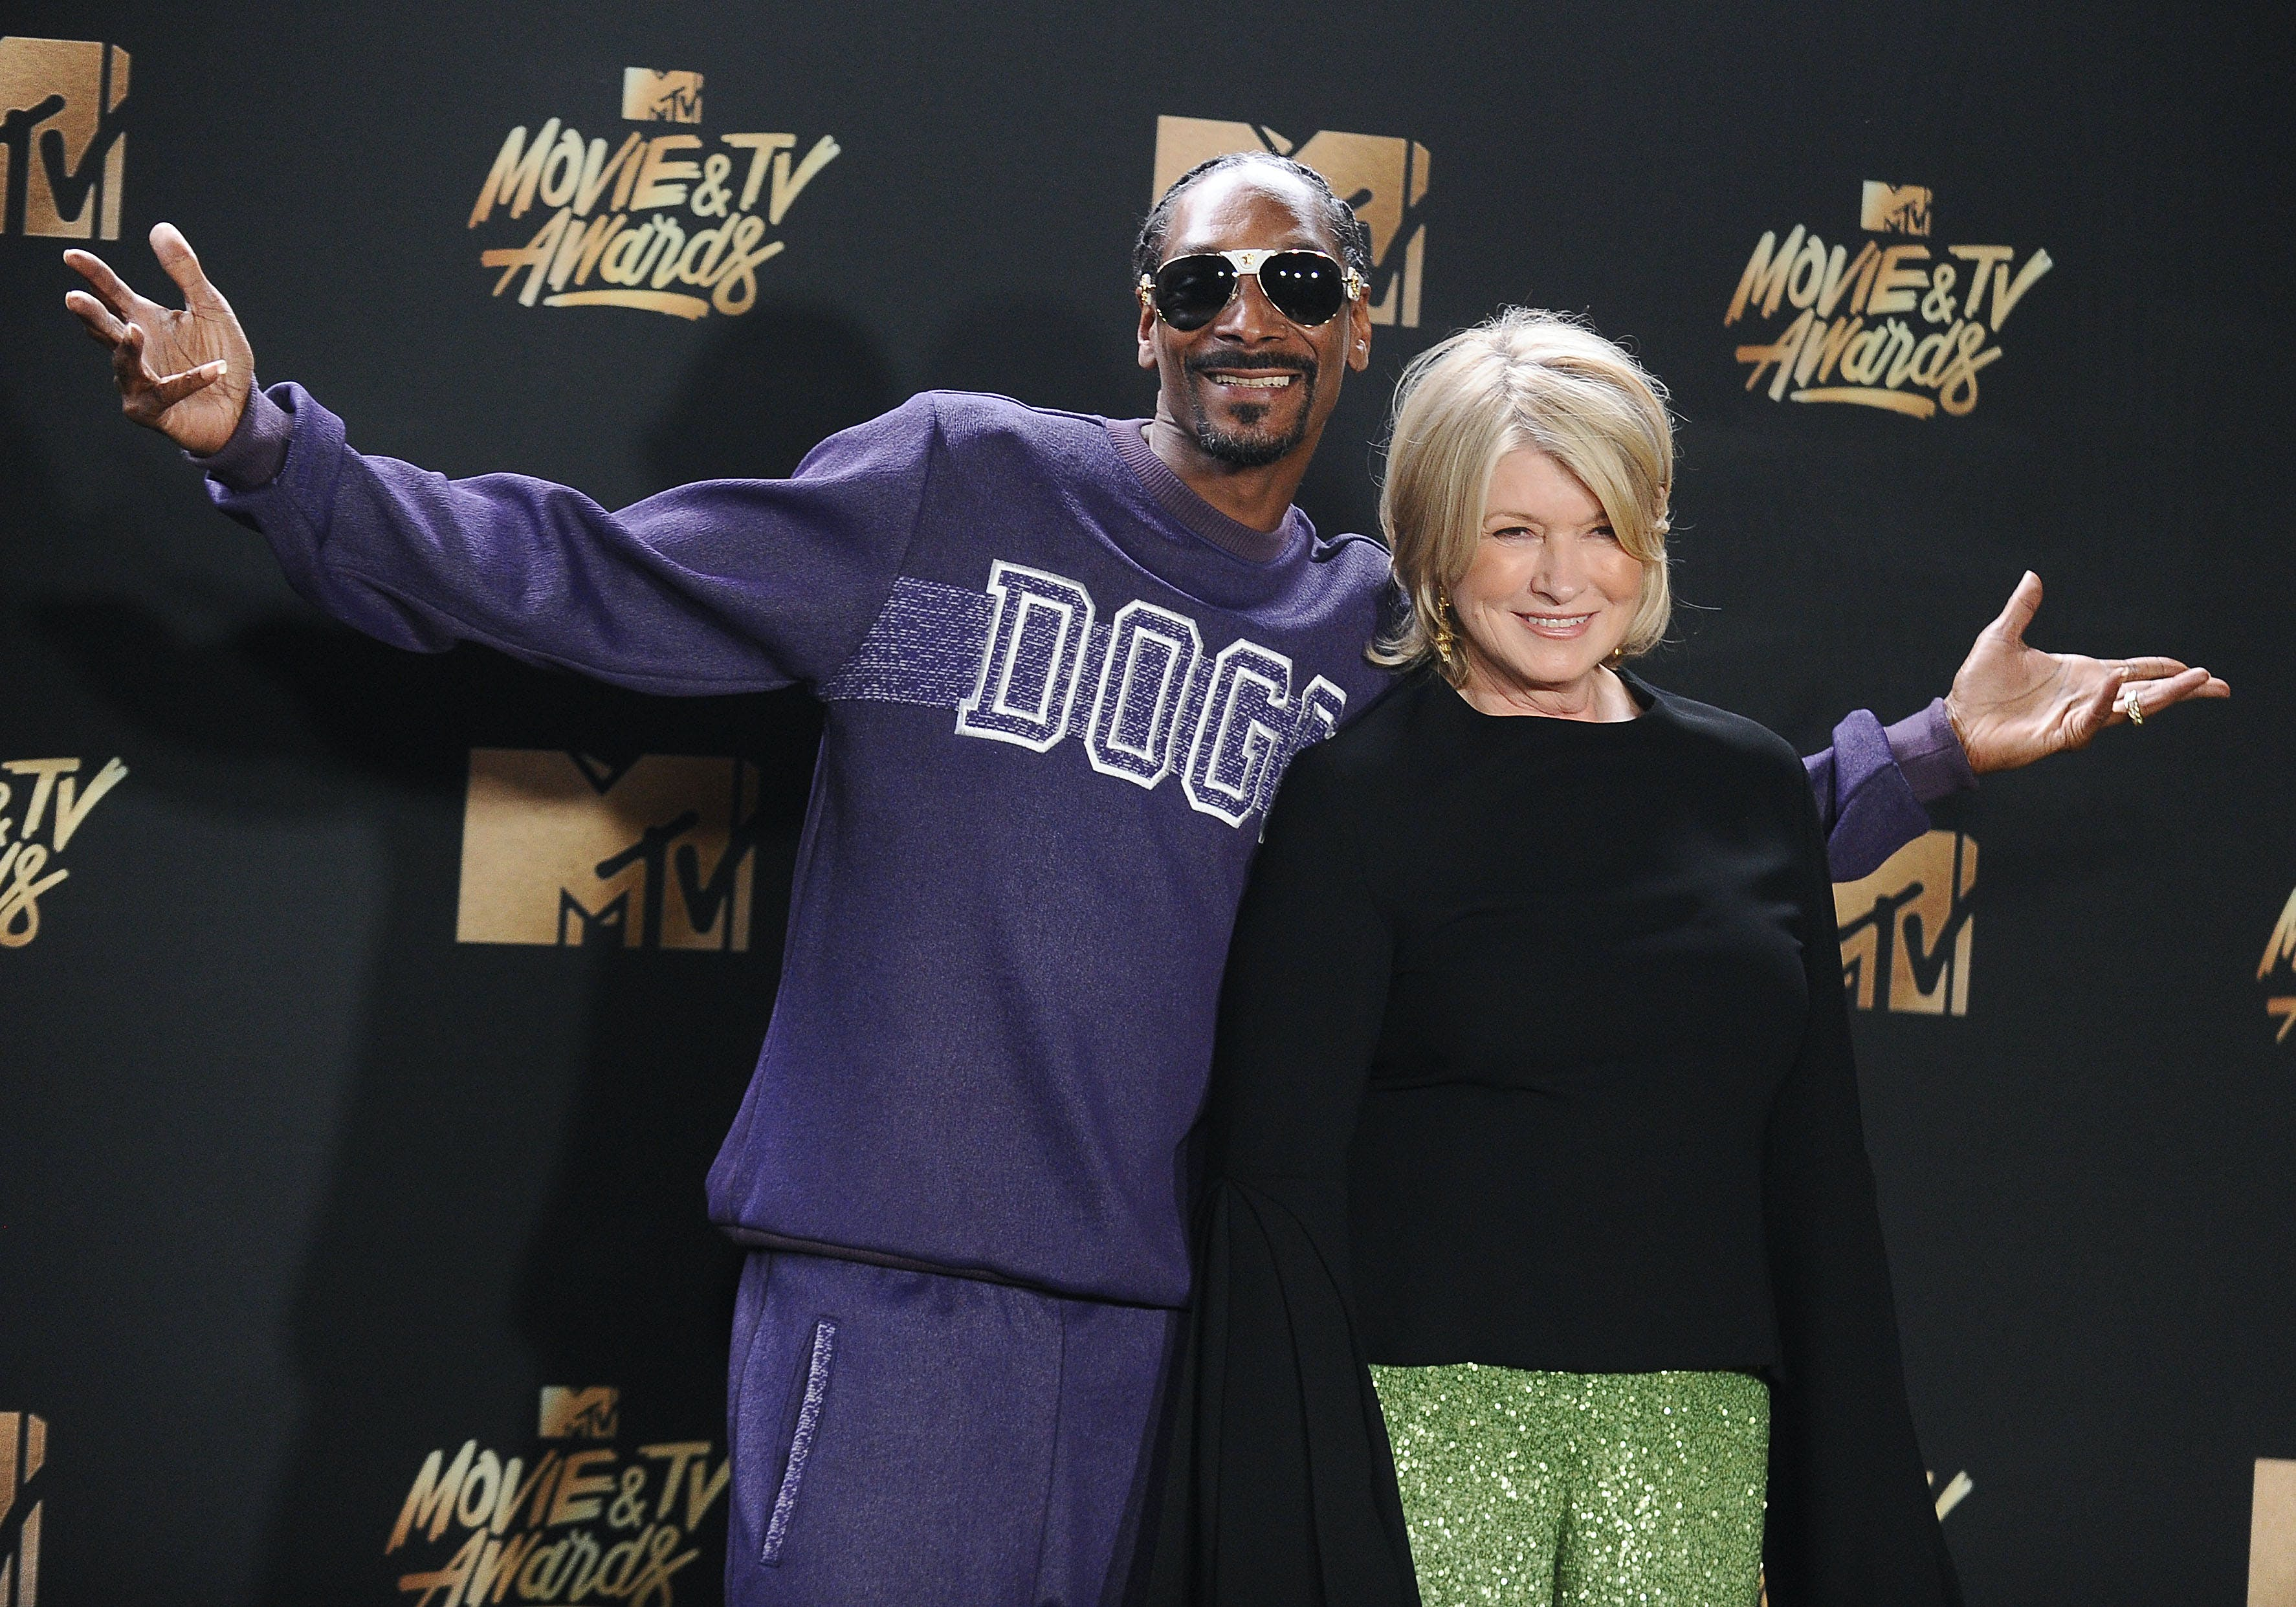 Martha Stewart and Snoop Dogg pose together